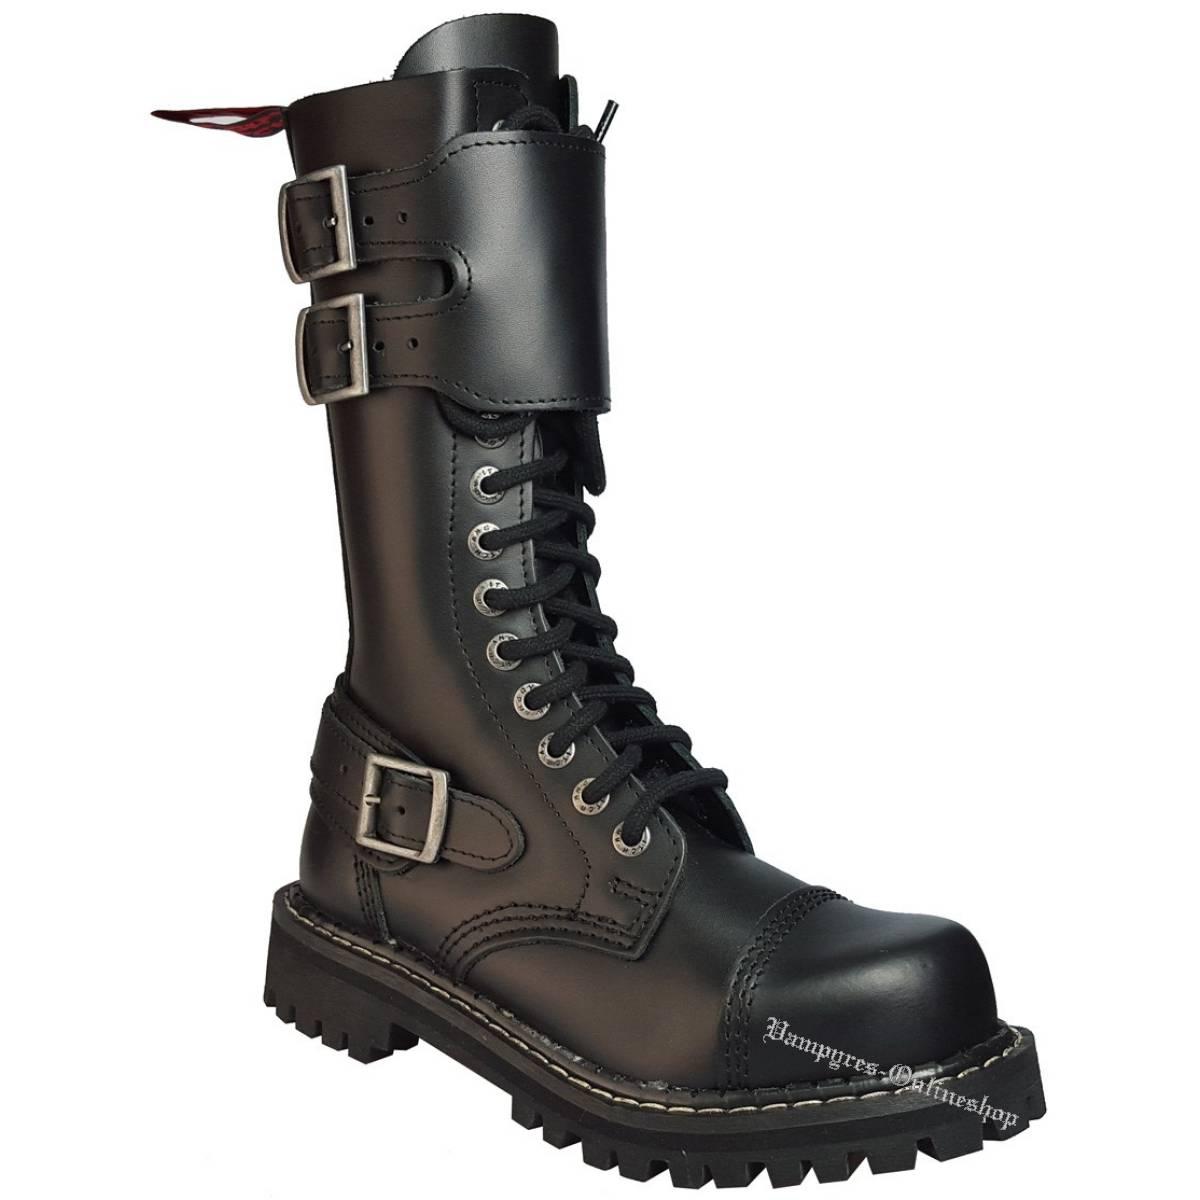 Angry Itch 14-Loch Shield Schwarz Rangers Stiefel Schuhe